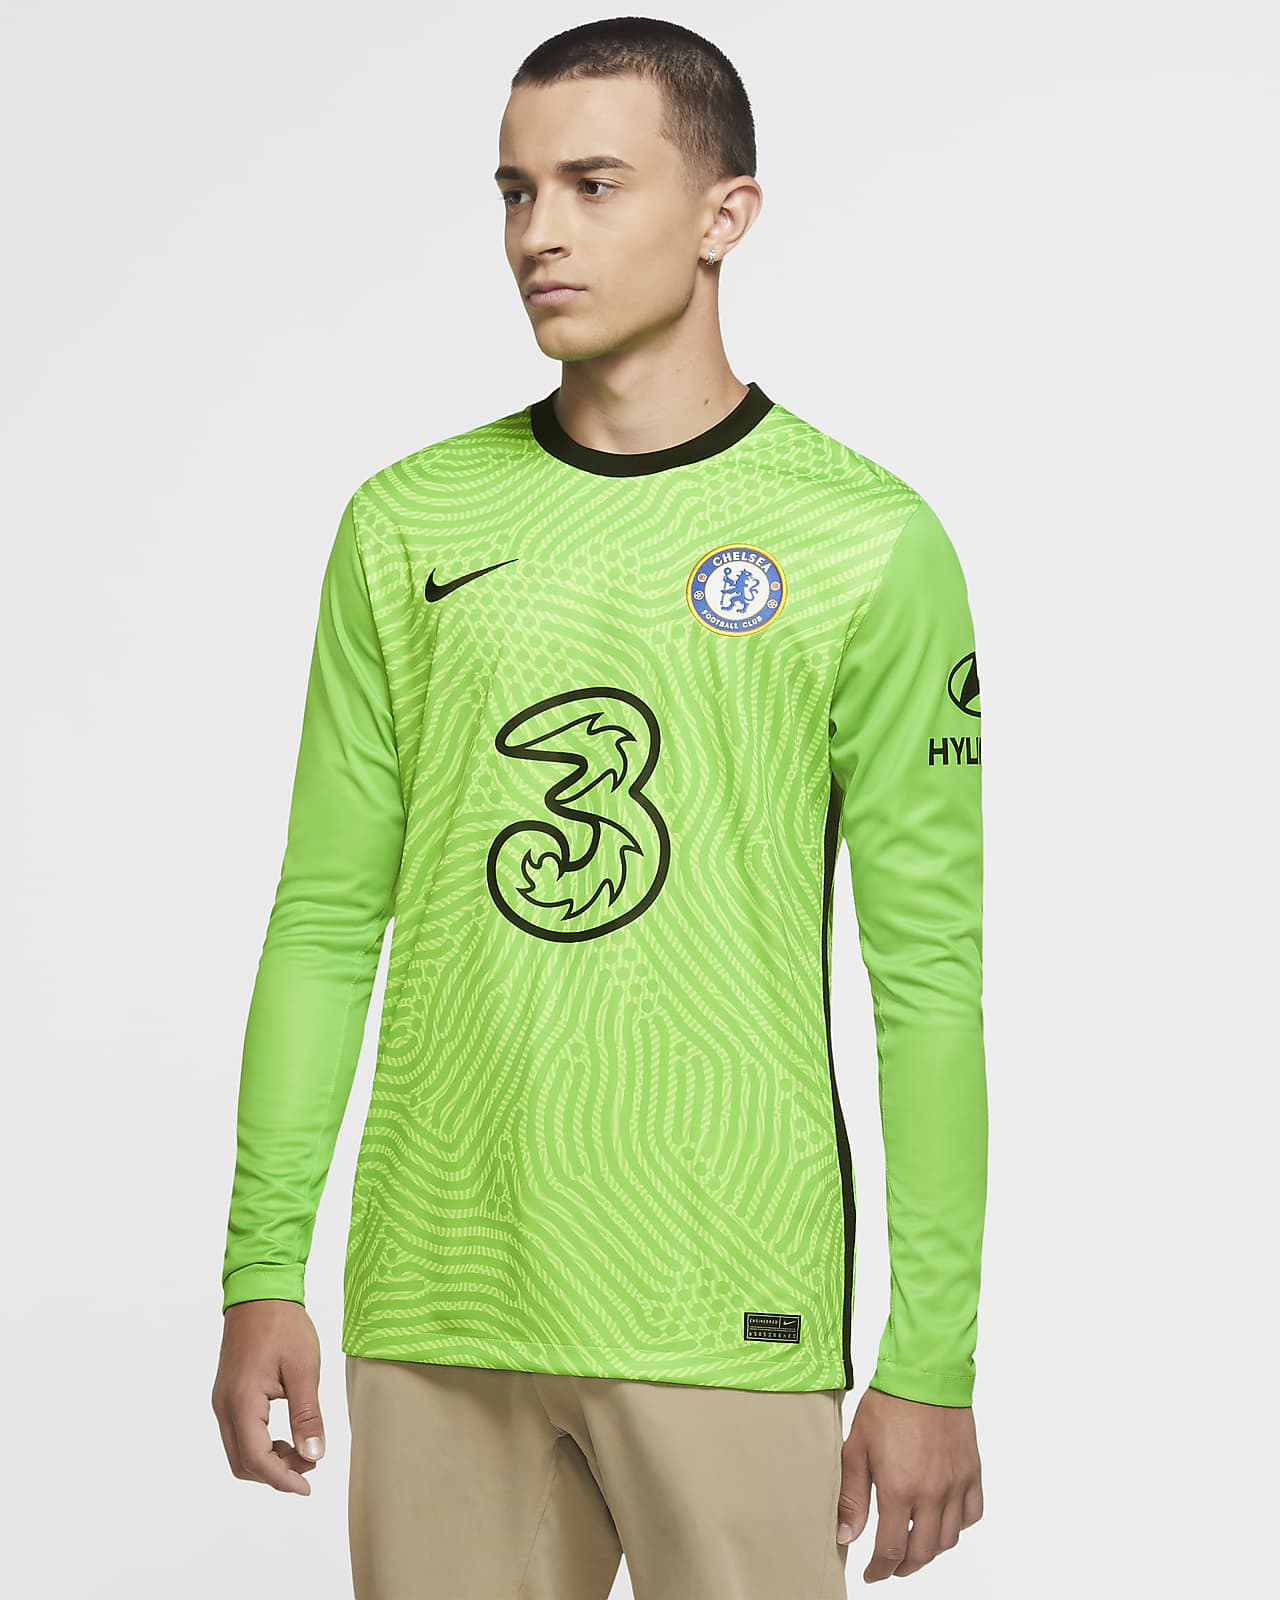 Camisola de futebol Stadium Goalkeeper Chelsea FC 2020/21 para homem